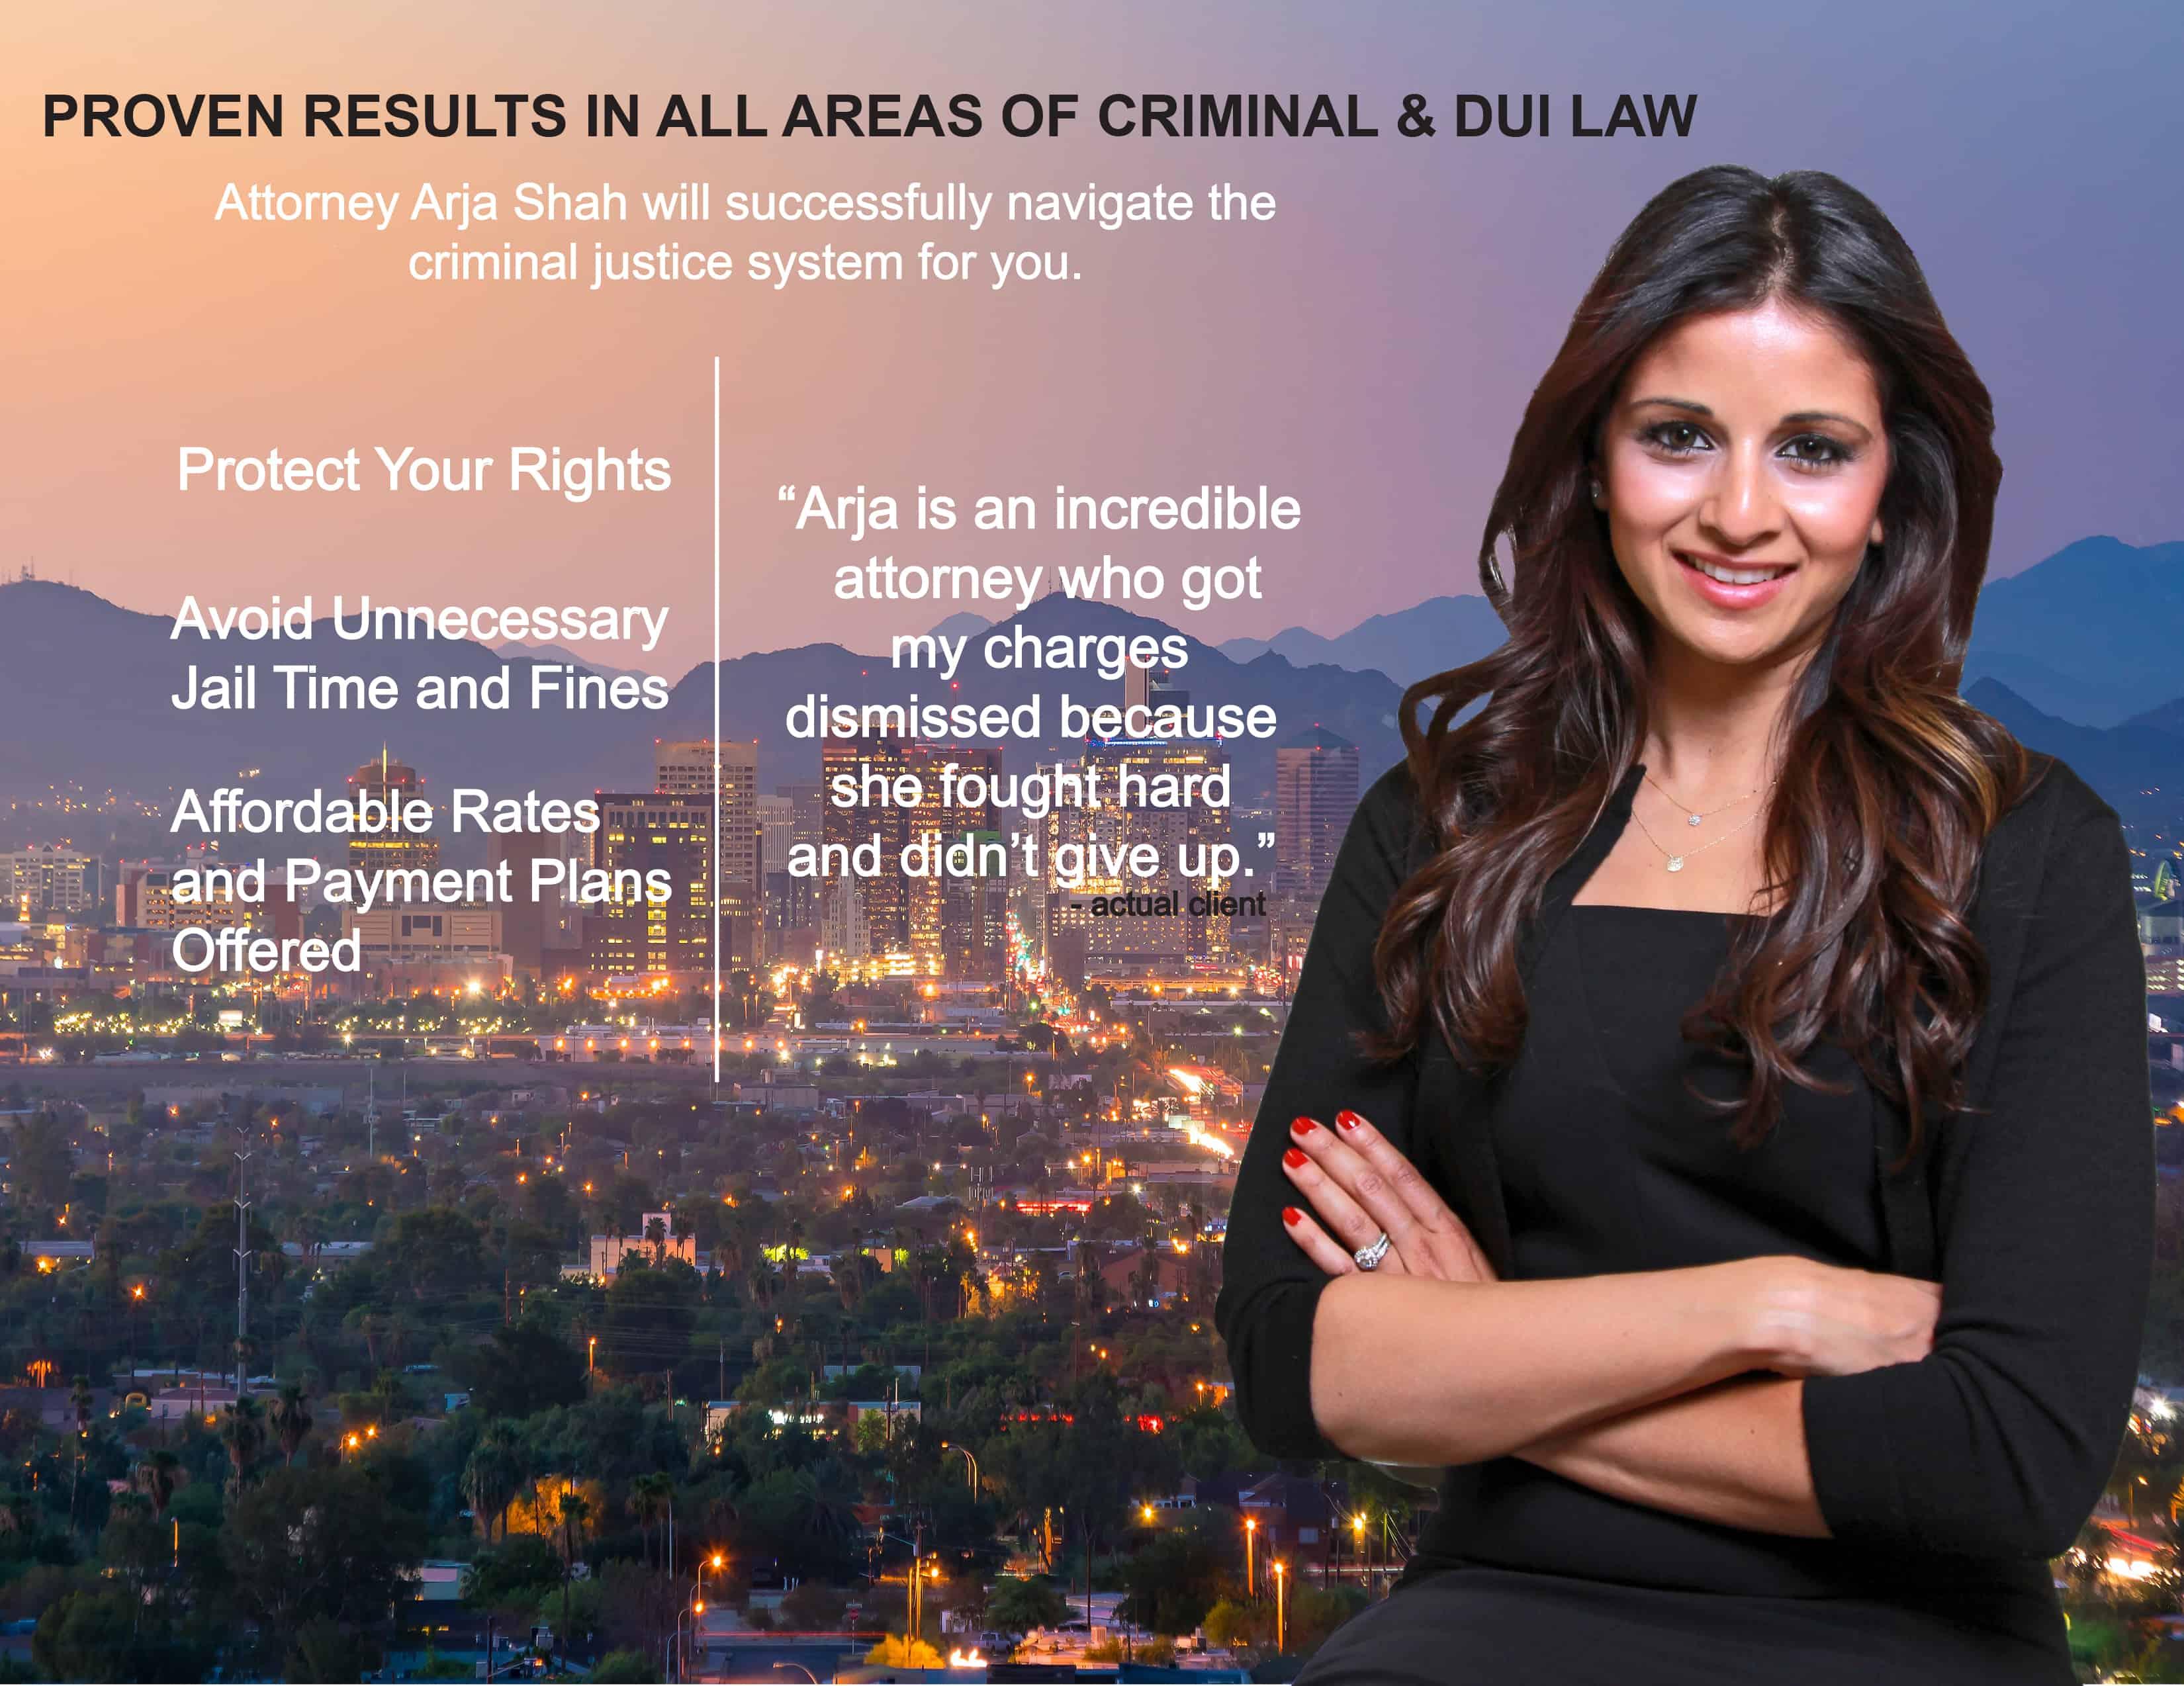 Attorney Arja Shah